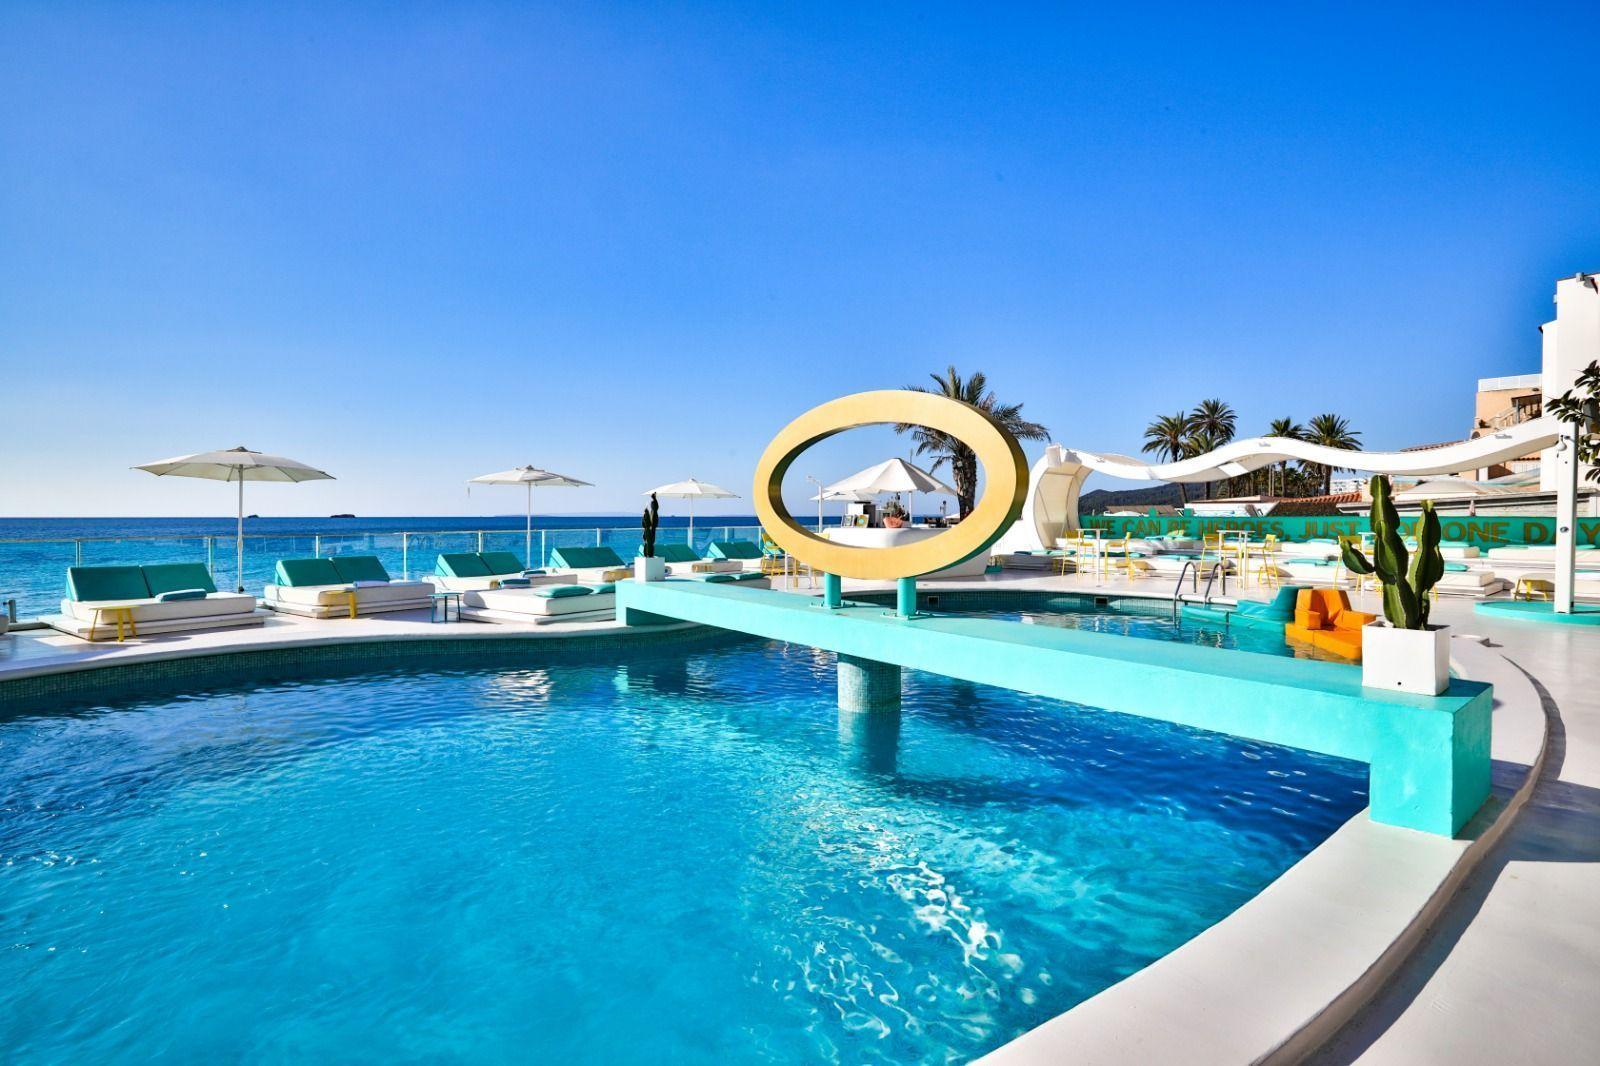 Santos Ibiza Suites - Diego Calvo entrevista - Concept Hotel Group